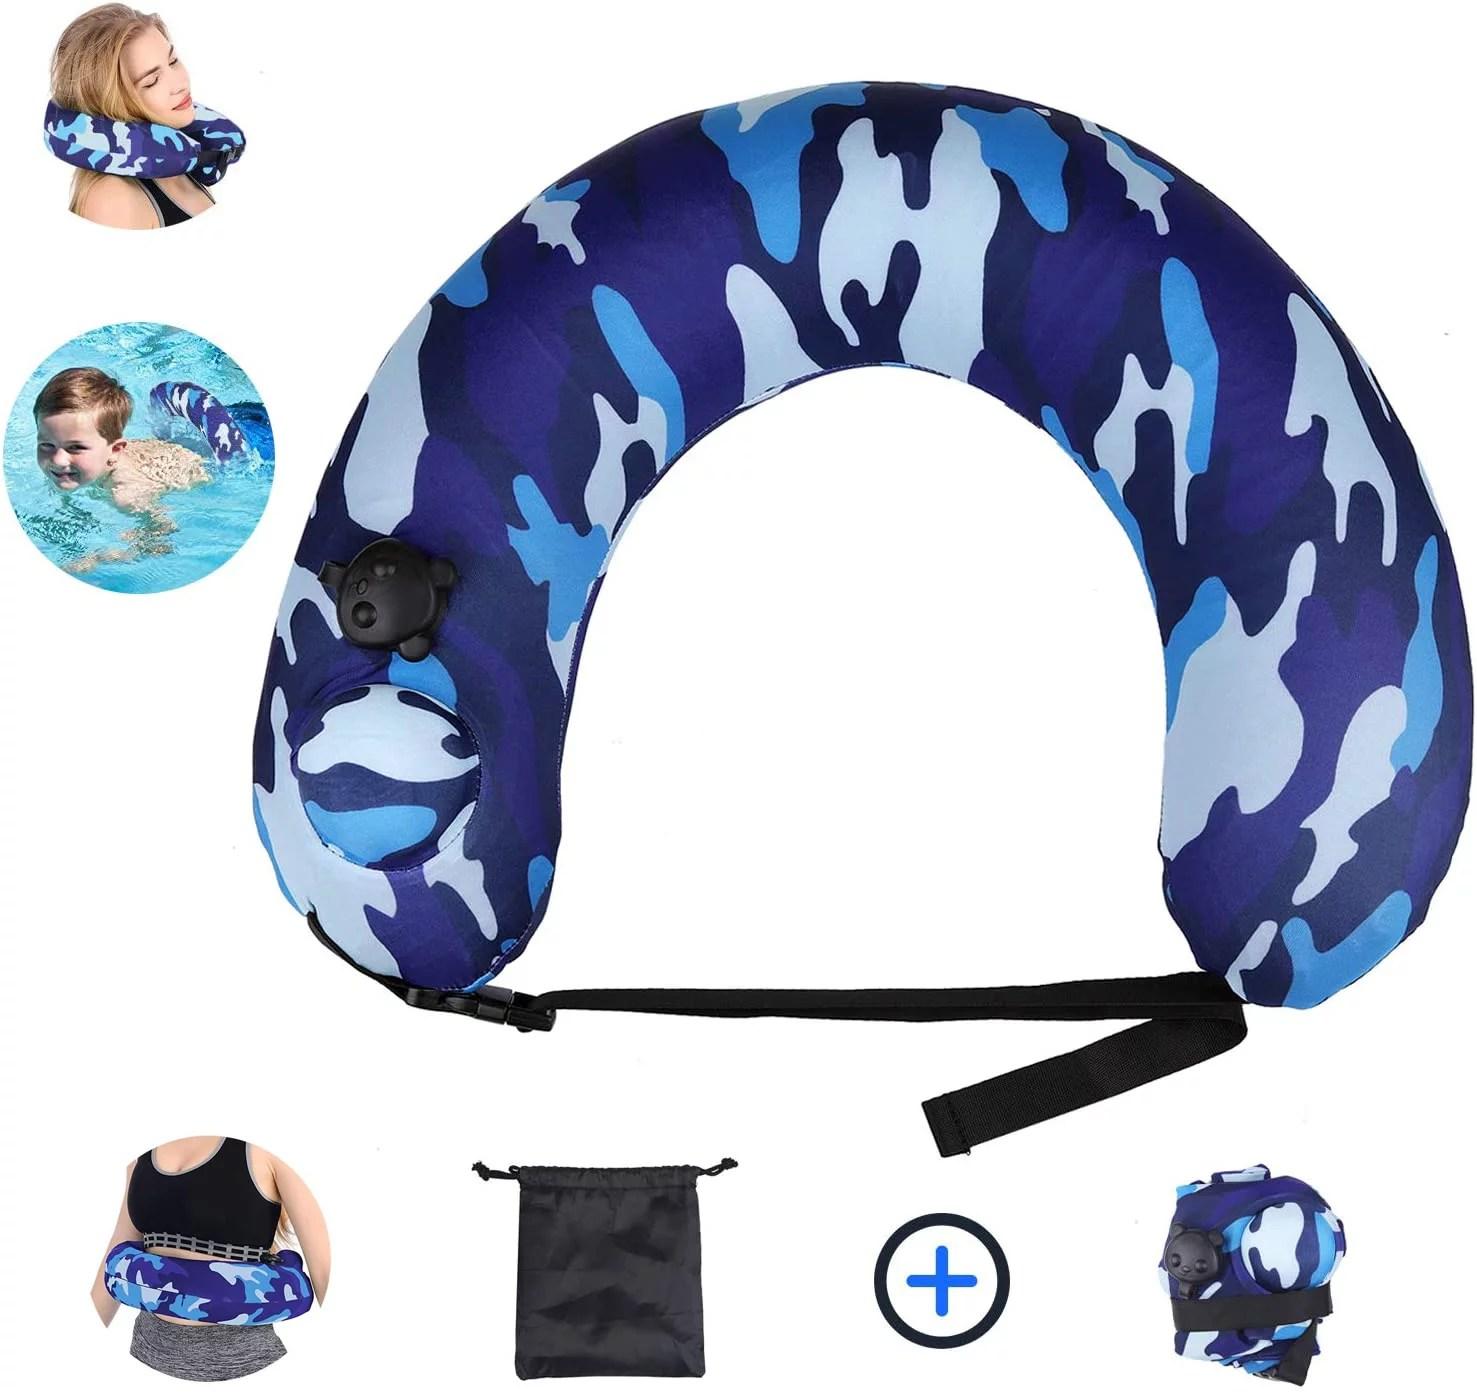 amerteer portable swim trainer swimming belt for kids adults inflatable neck pillow for airplane travel life belts kickboard for kids flotation